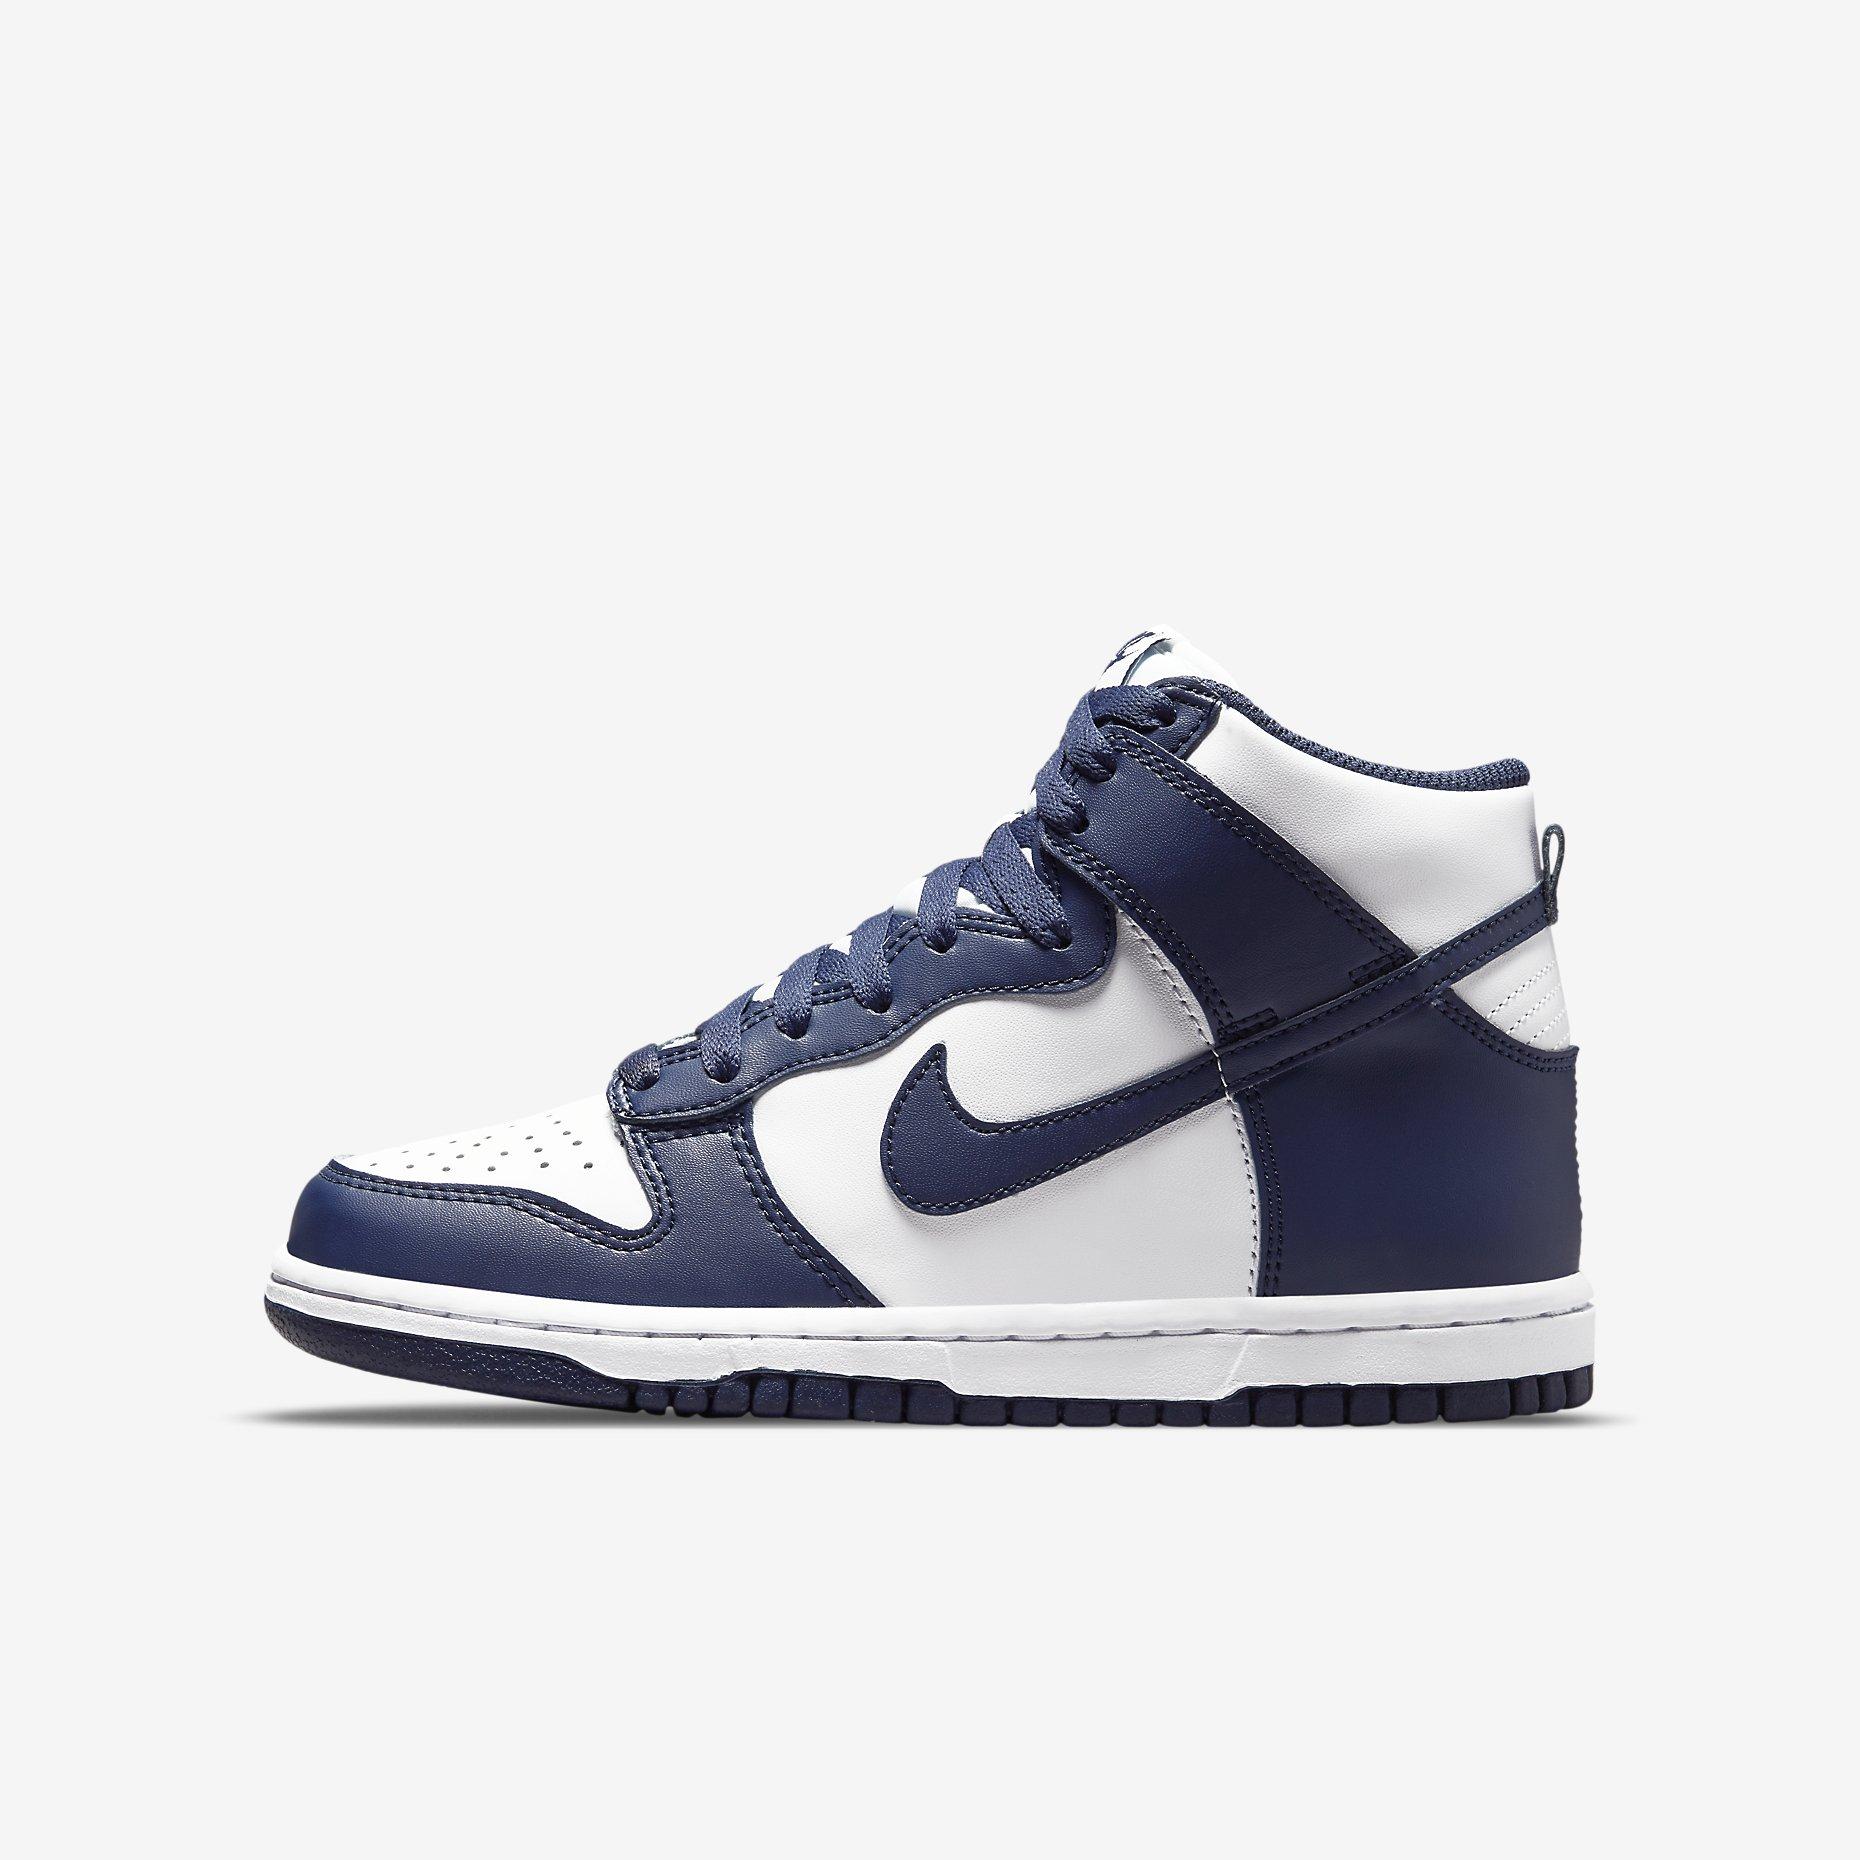 Nike Dunk High GS 'Midnight Navy'